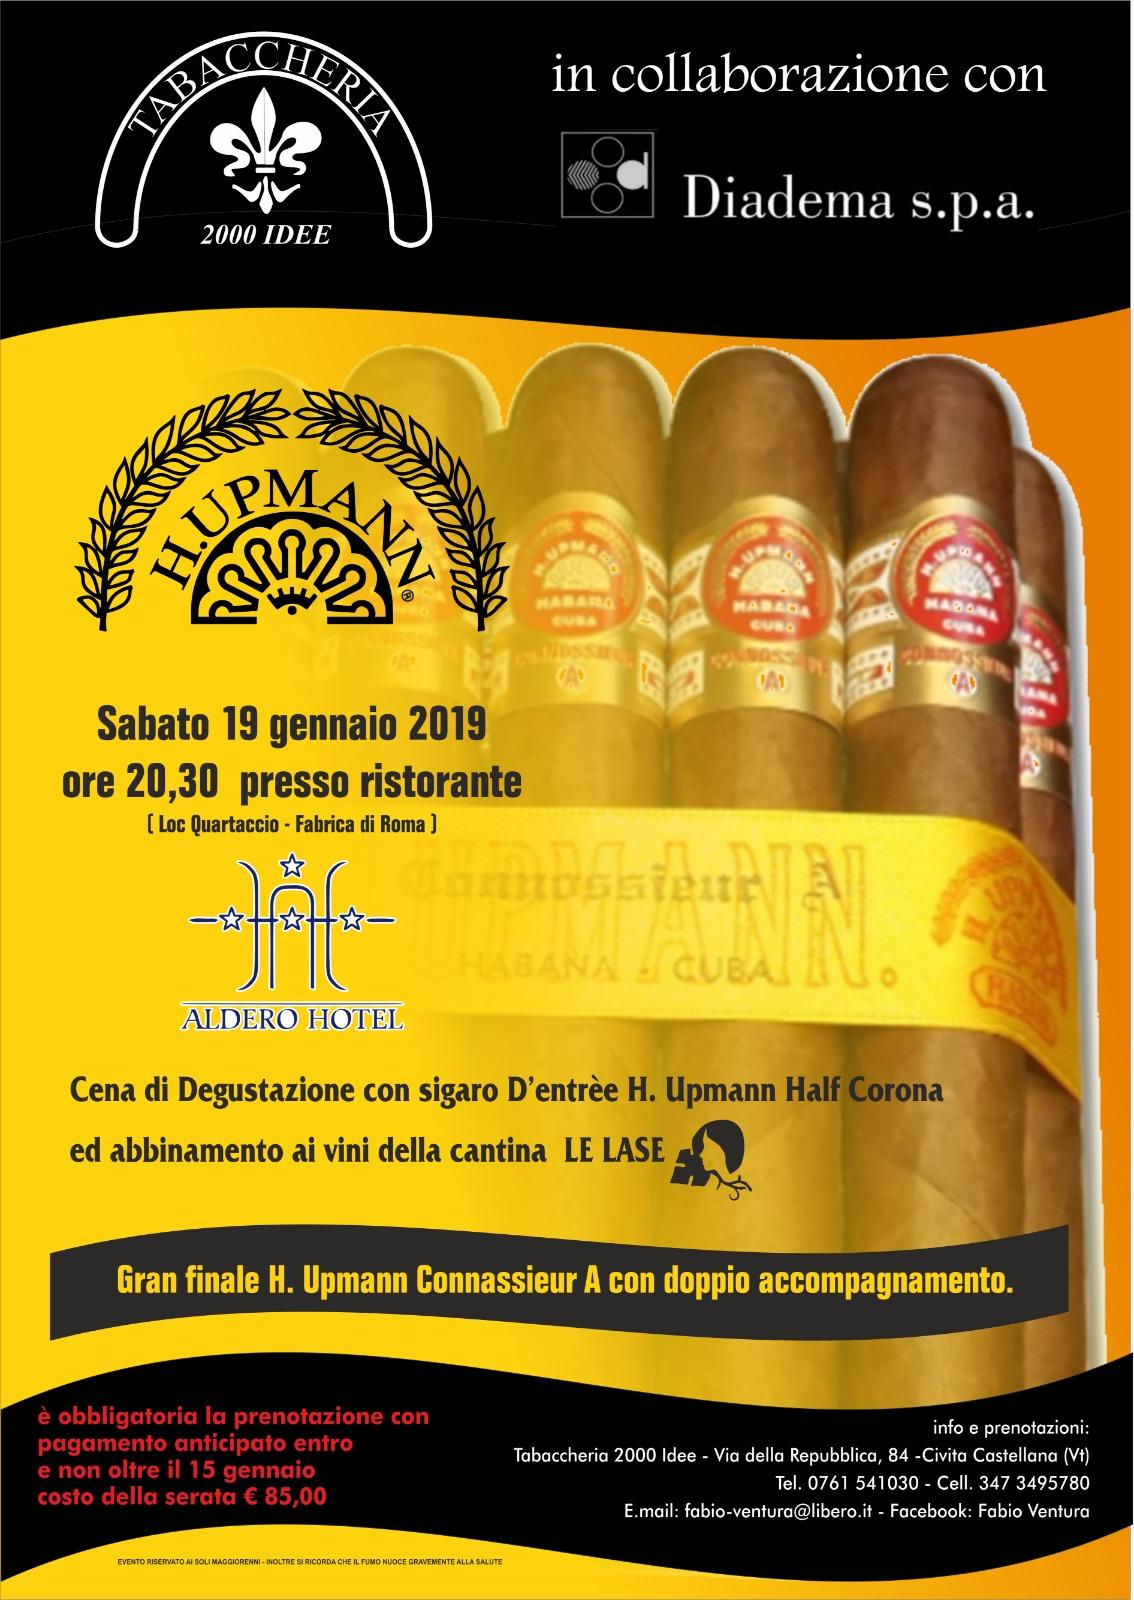 Tabaccheria-Duemila-Idee